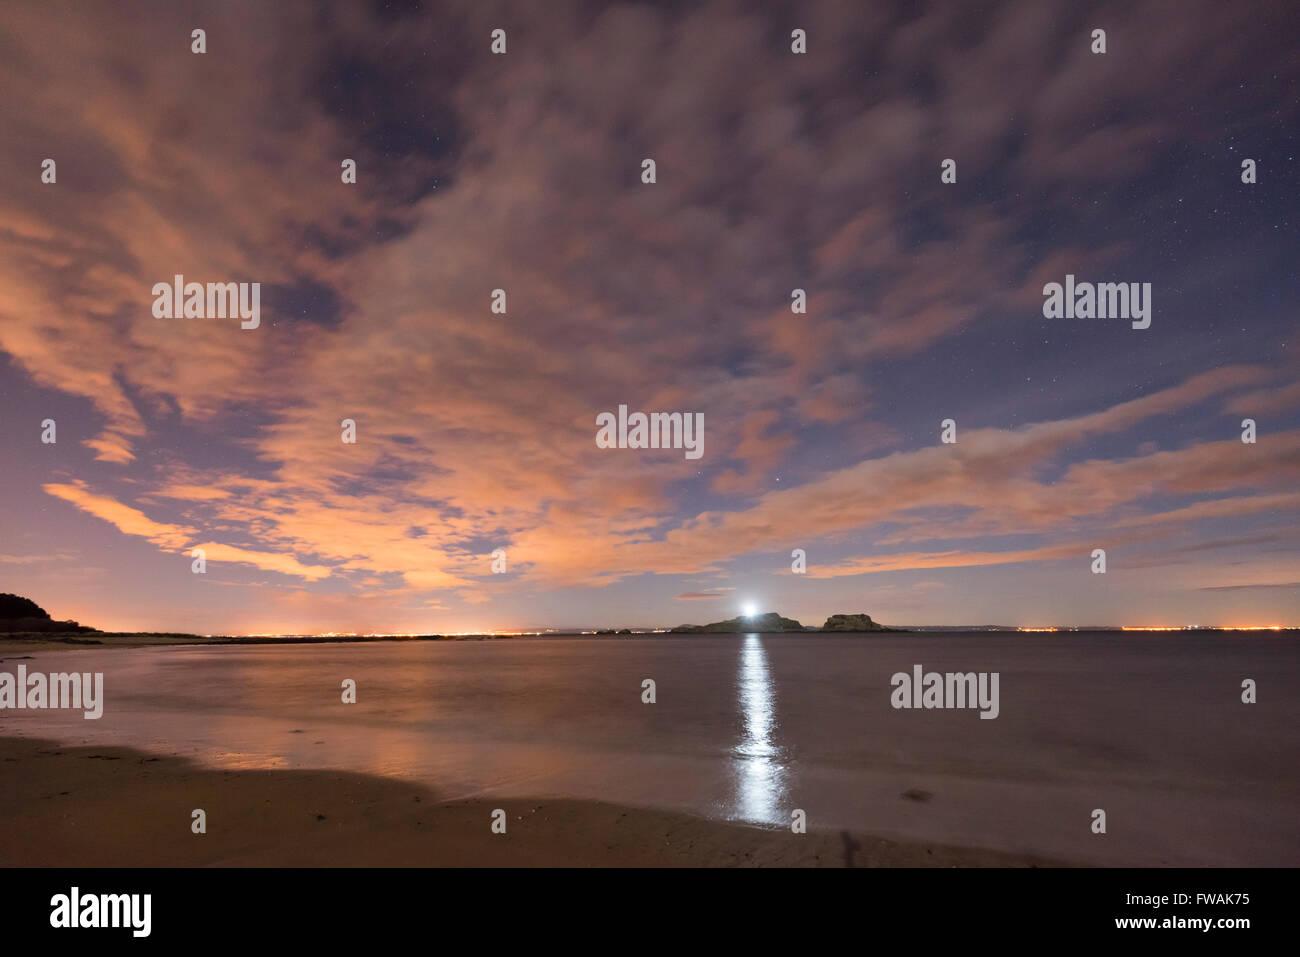 Fidra island and night sky over the Firth of Forth estuary, East Lothian, Scotland - Stock Image